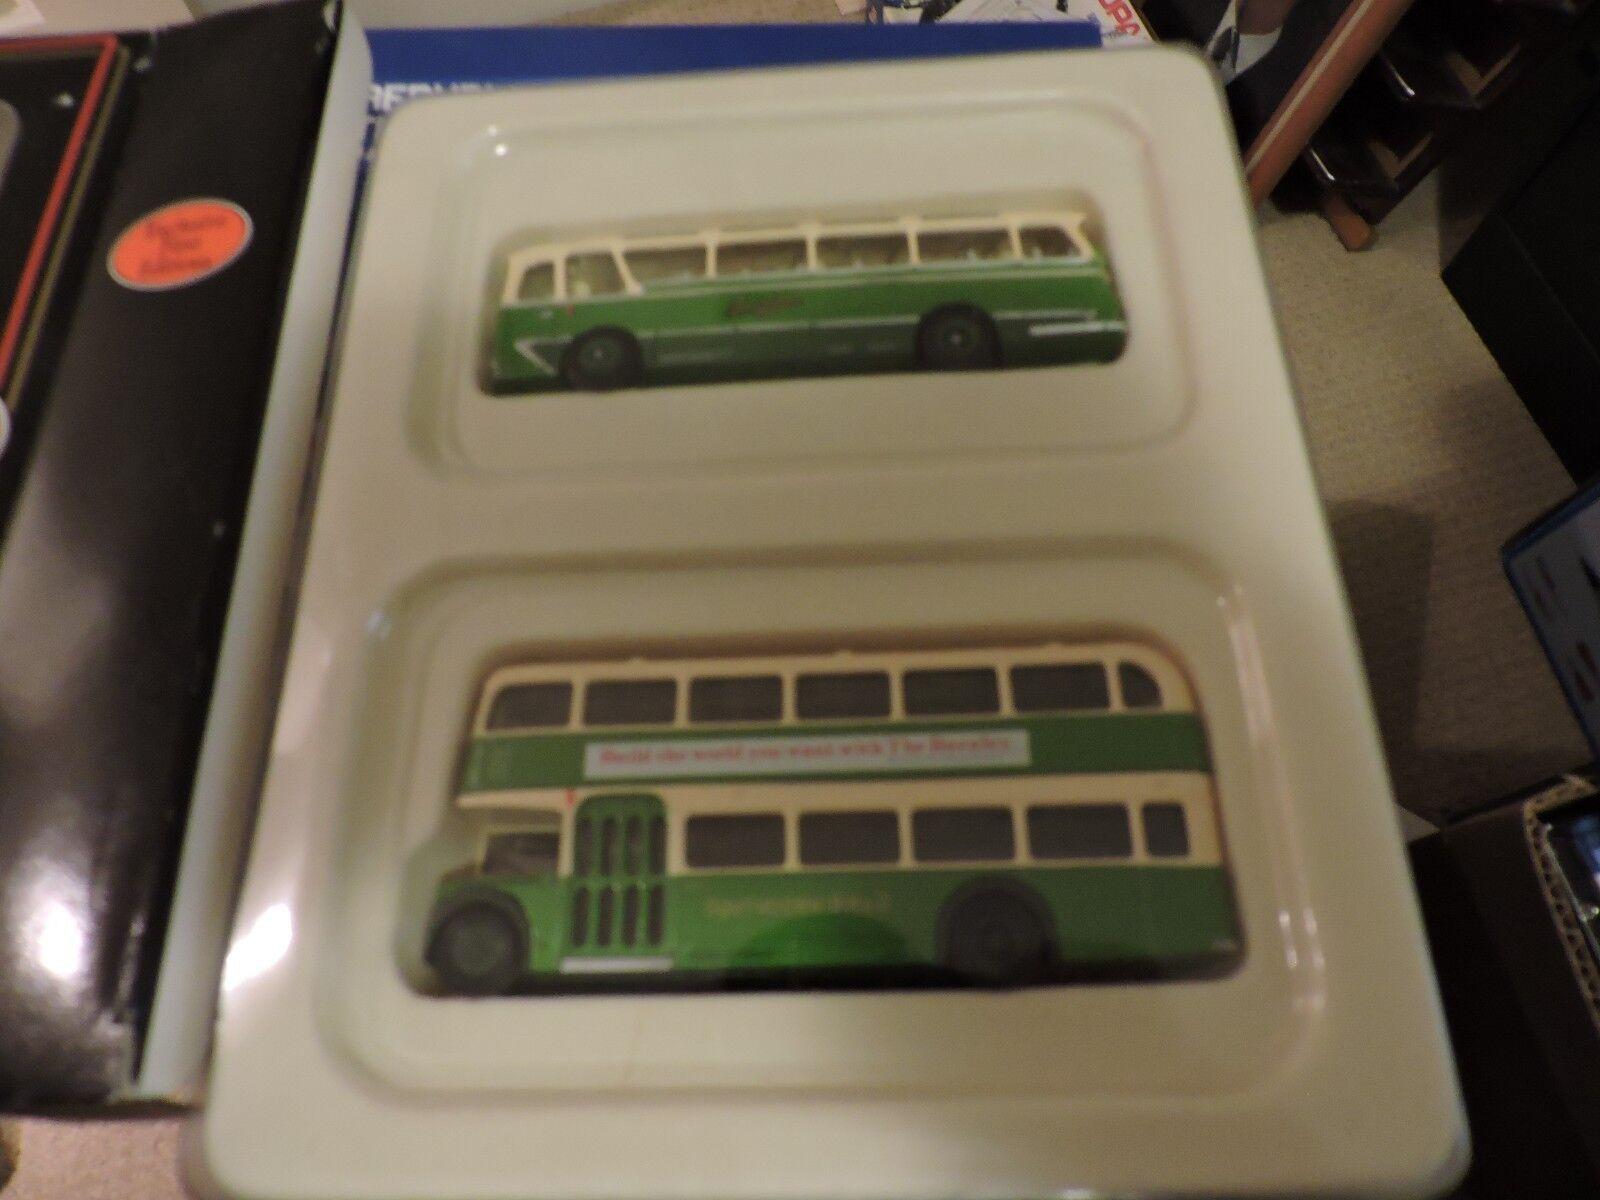 Corgi presión fundida 1 76th escala leyland Leopard southdown autobús autobús autobús set  2 adc454